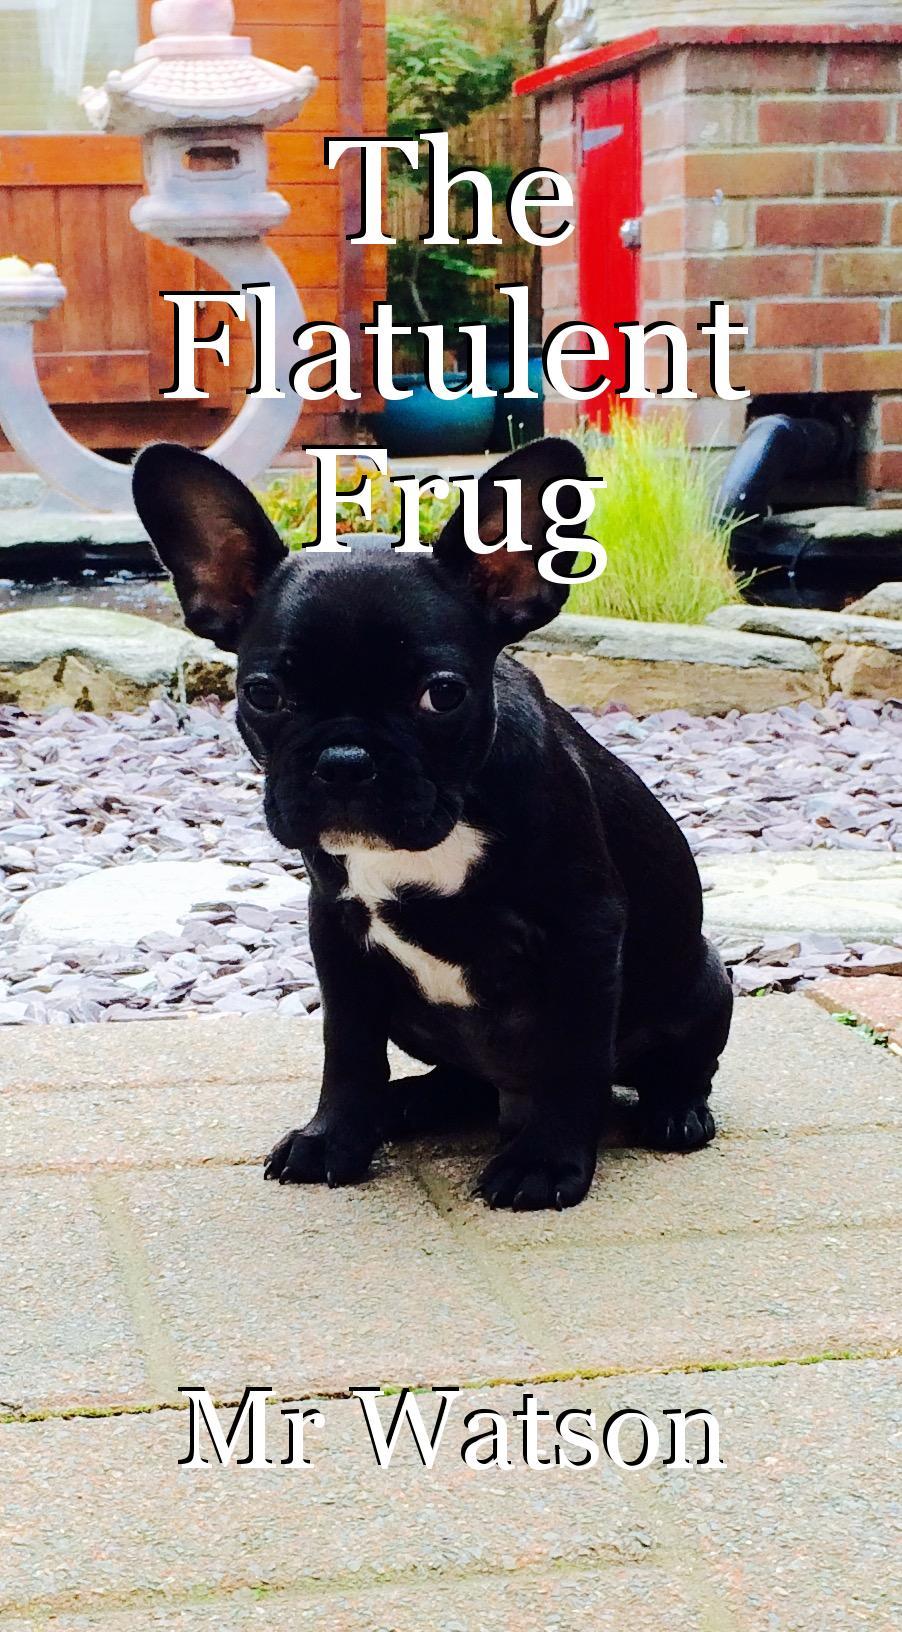 The Flatulent Frug , poem by Mr Watson